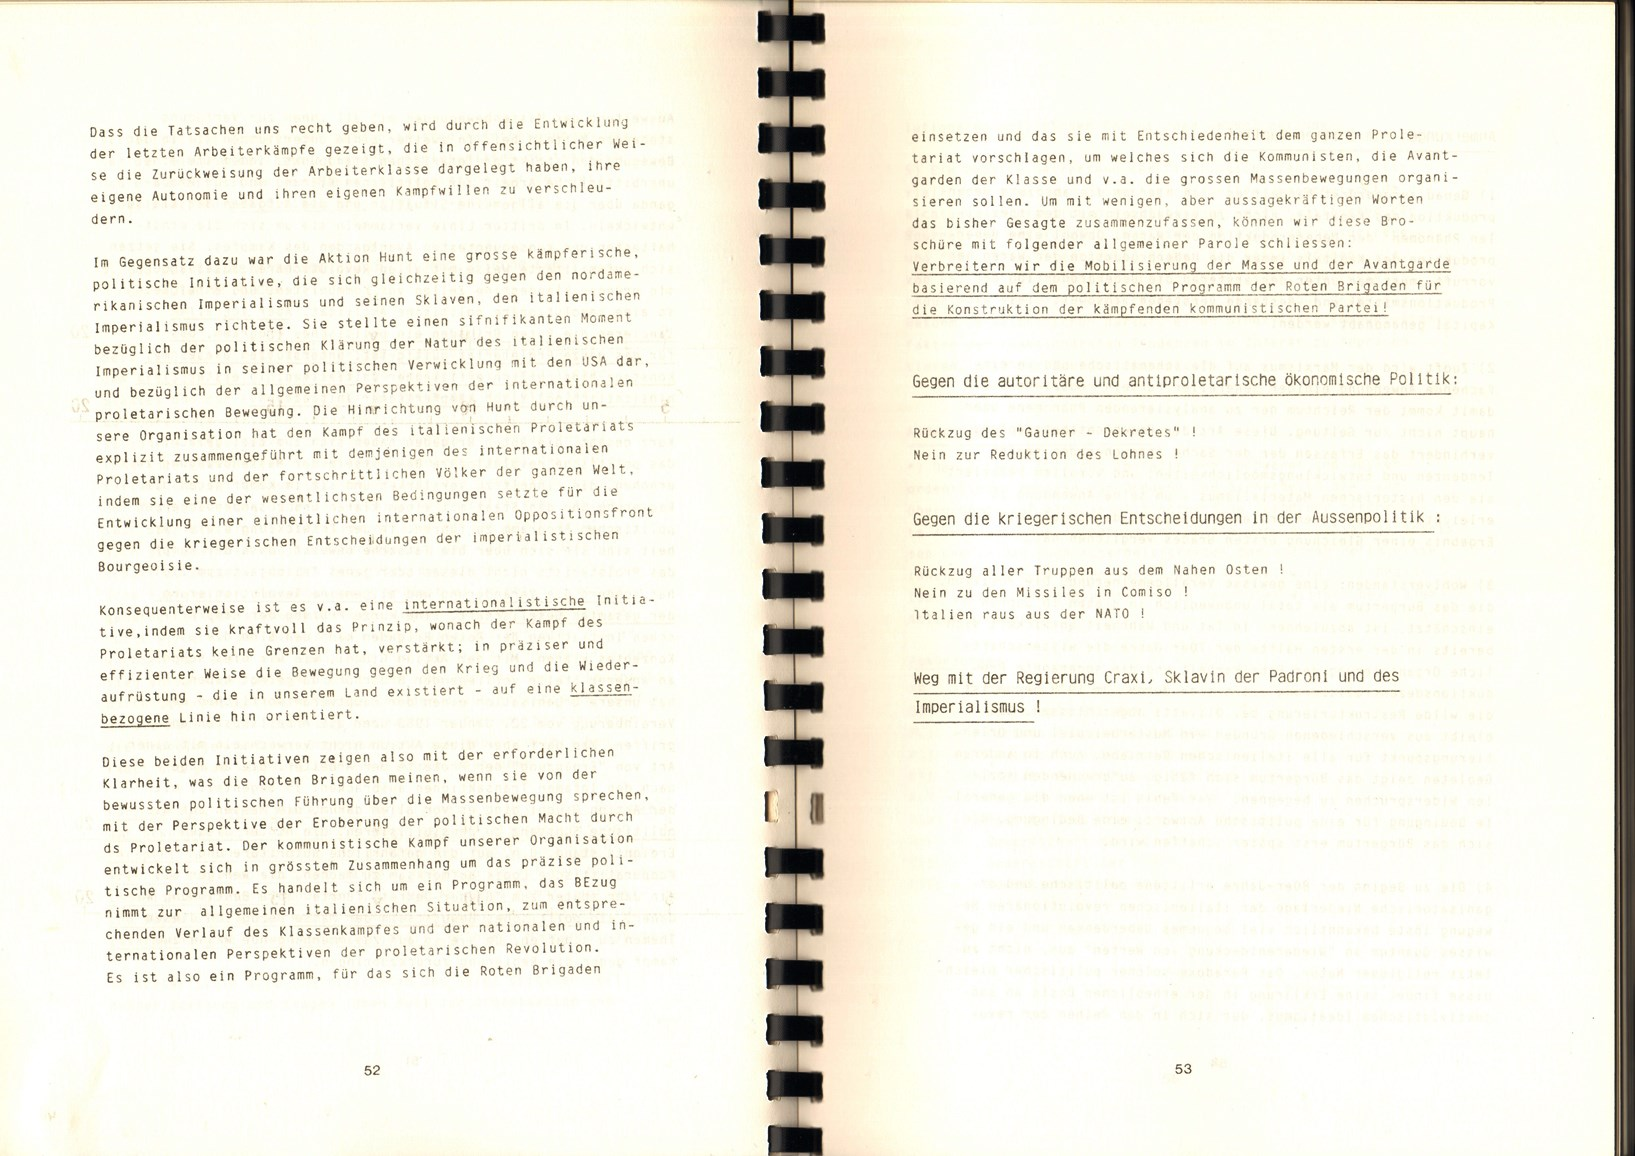 Internationale_Debatte_1985_Brigate_Rosse_028